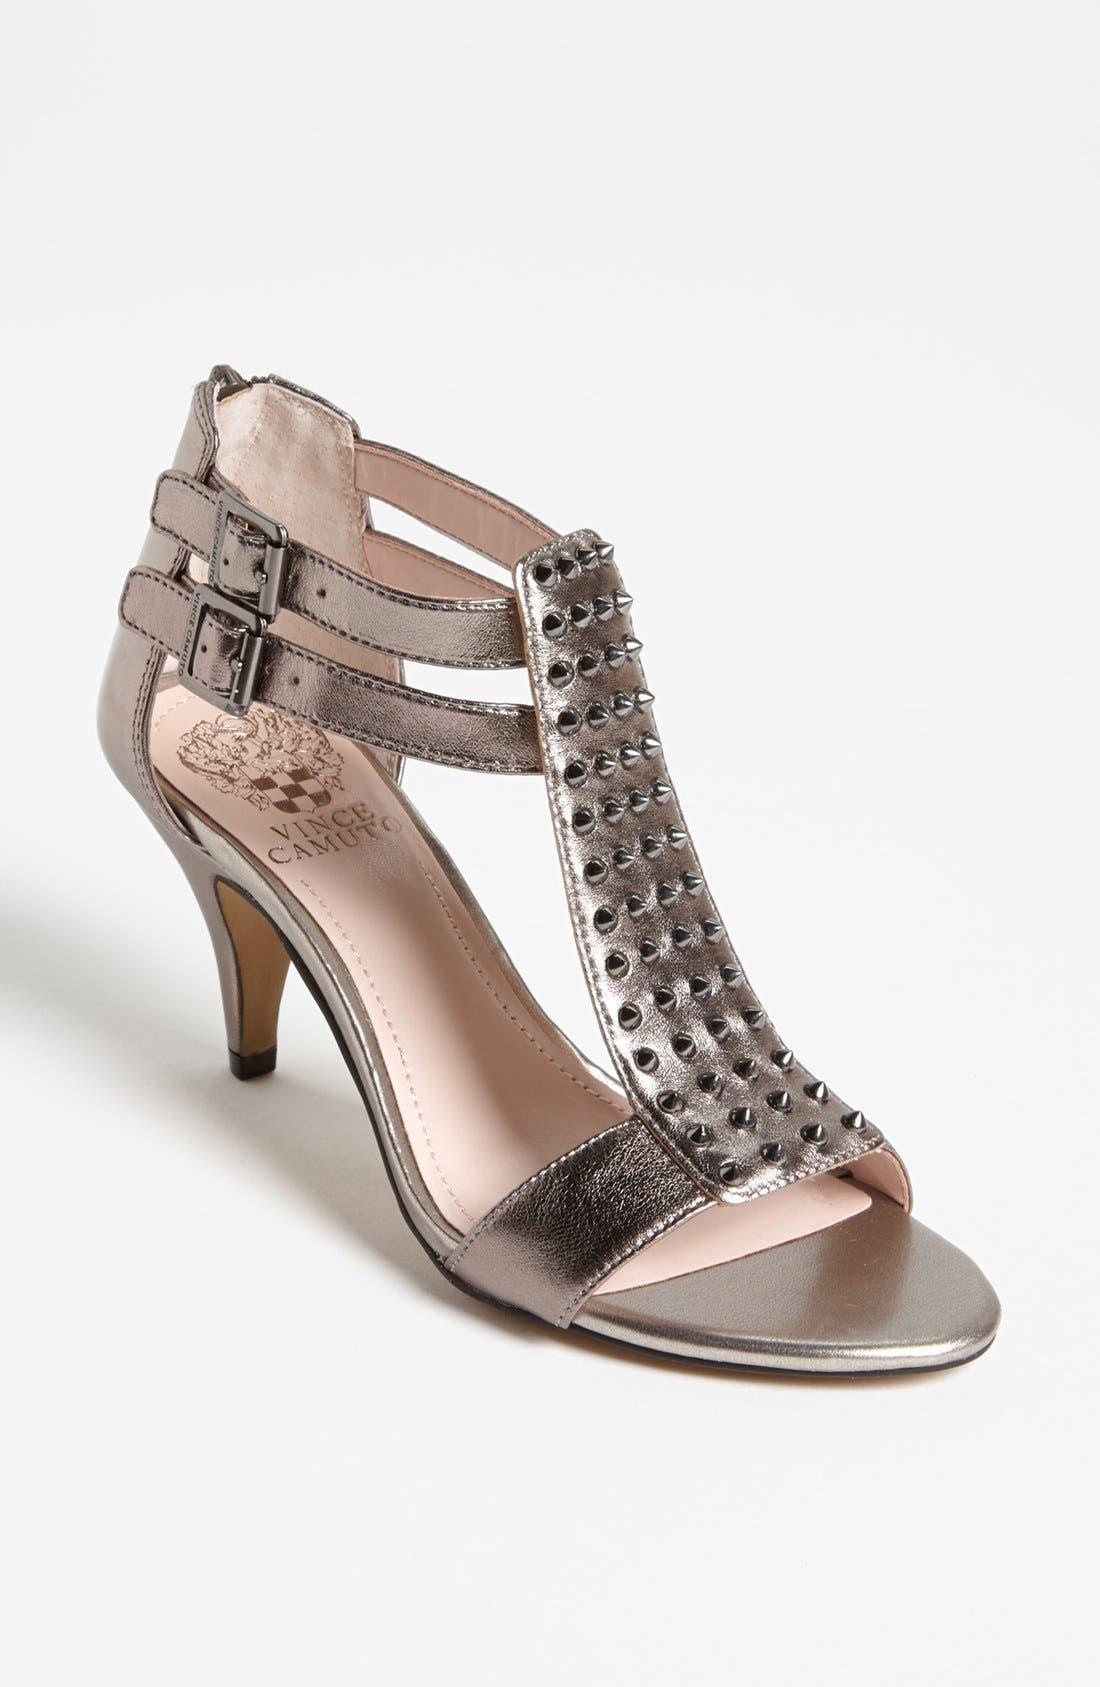 Main Image - Vince Camuto 'Minter' Sandal